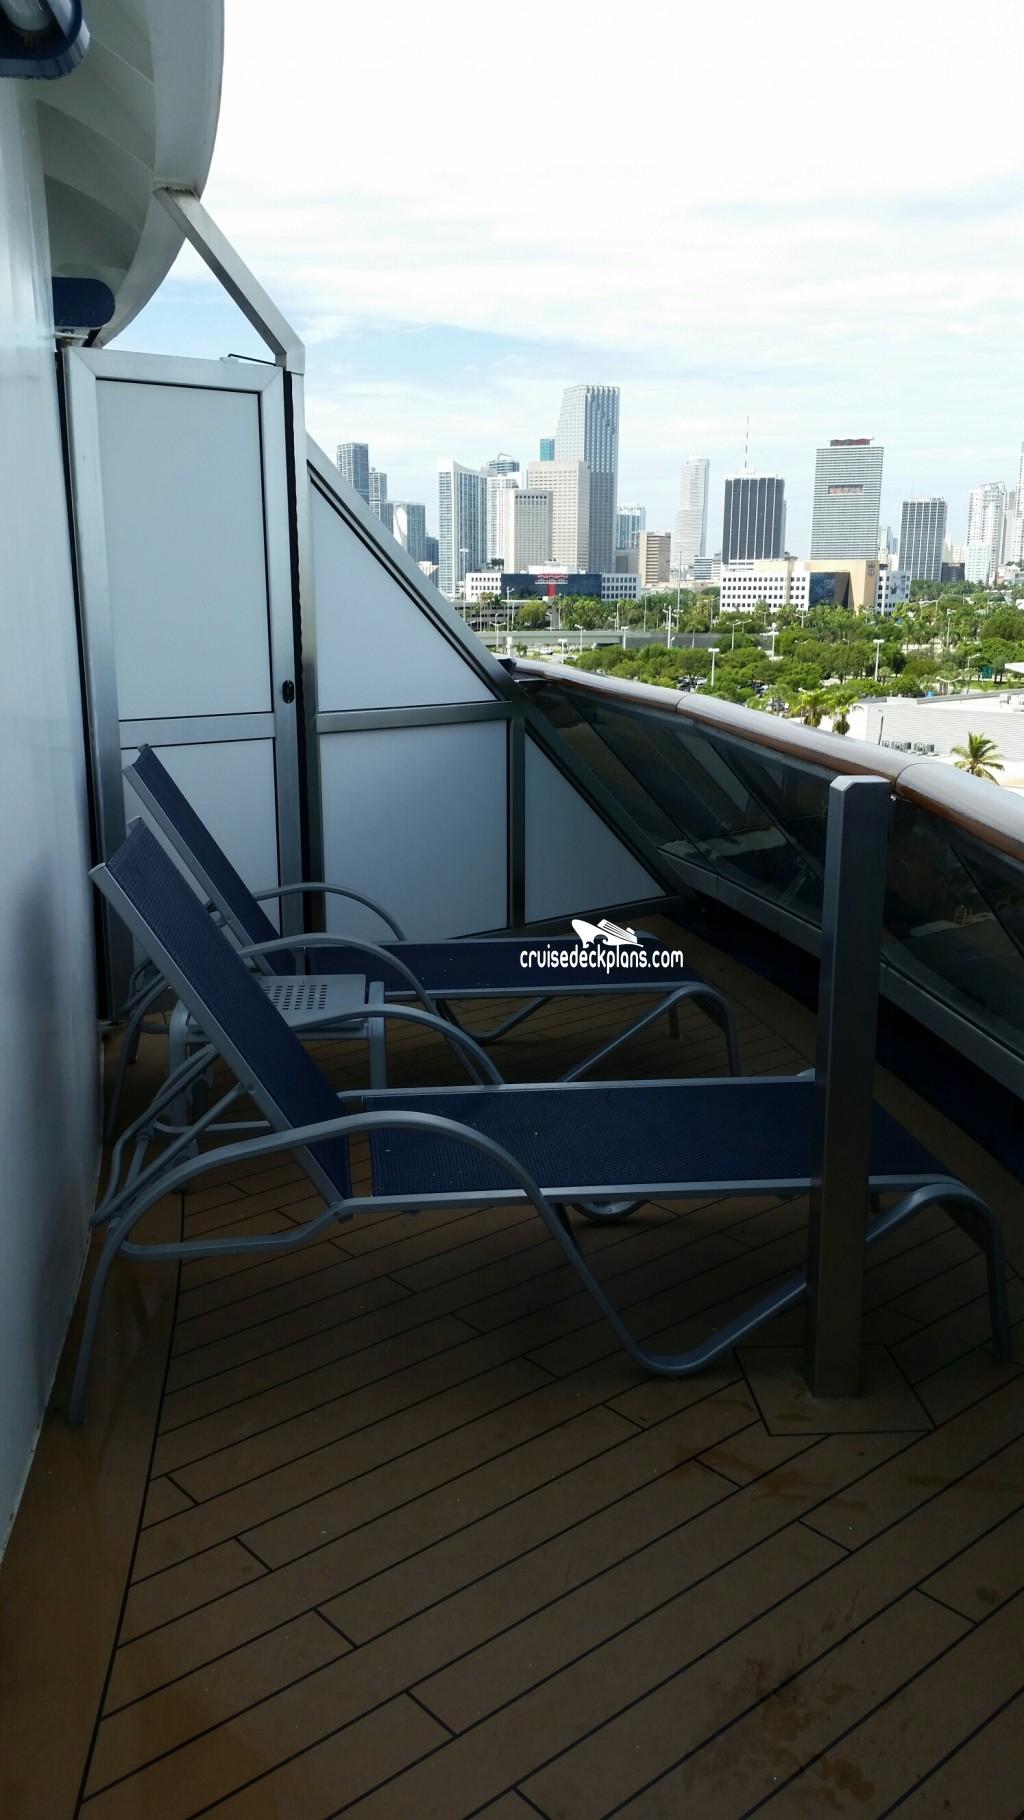 Balcony Floor Design: Carnival Breeze Premium Balcony Stateroom